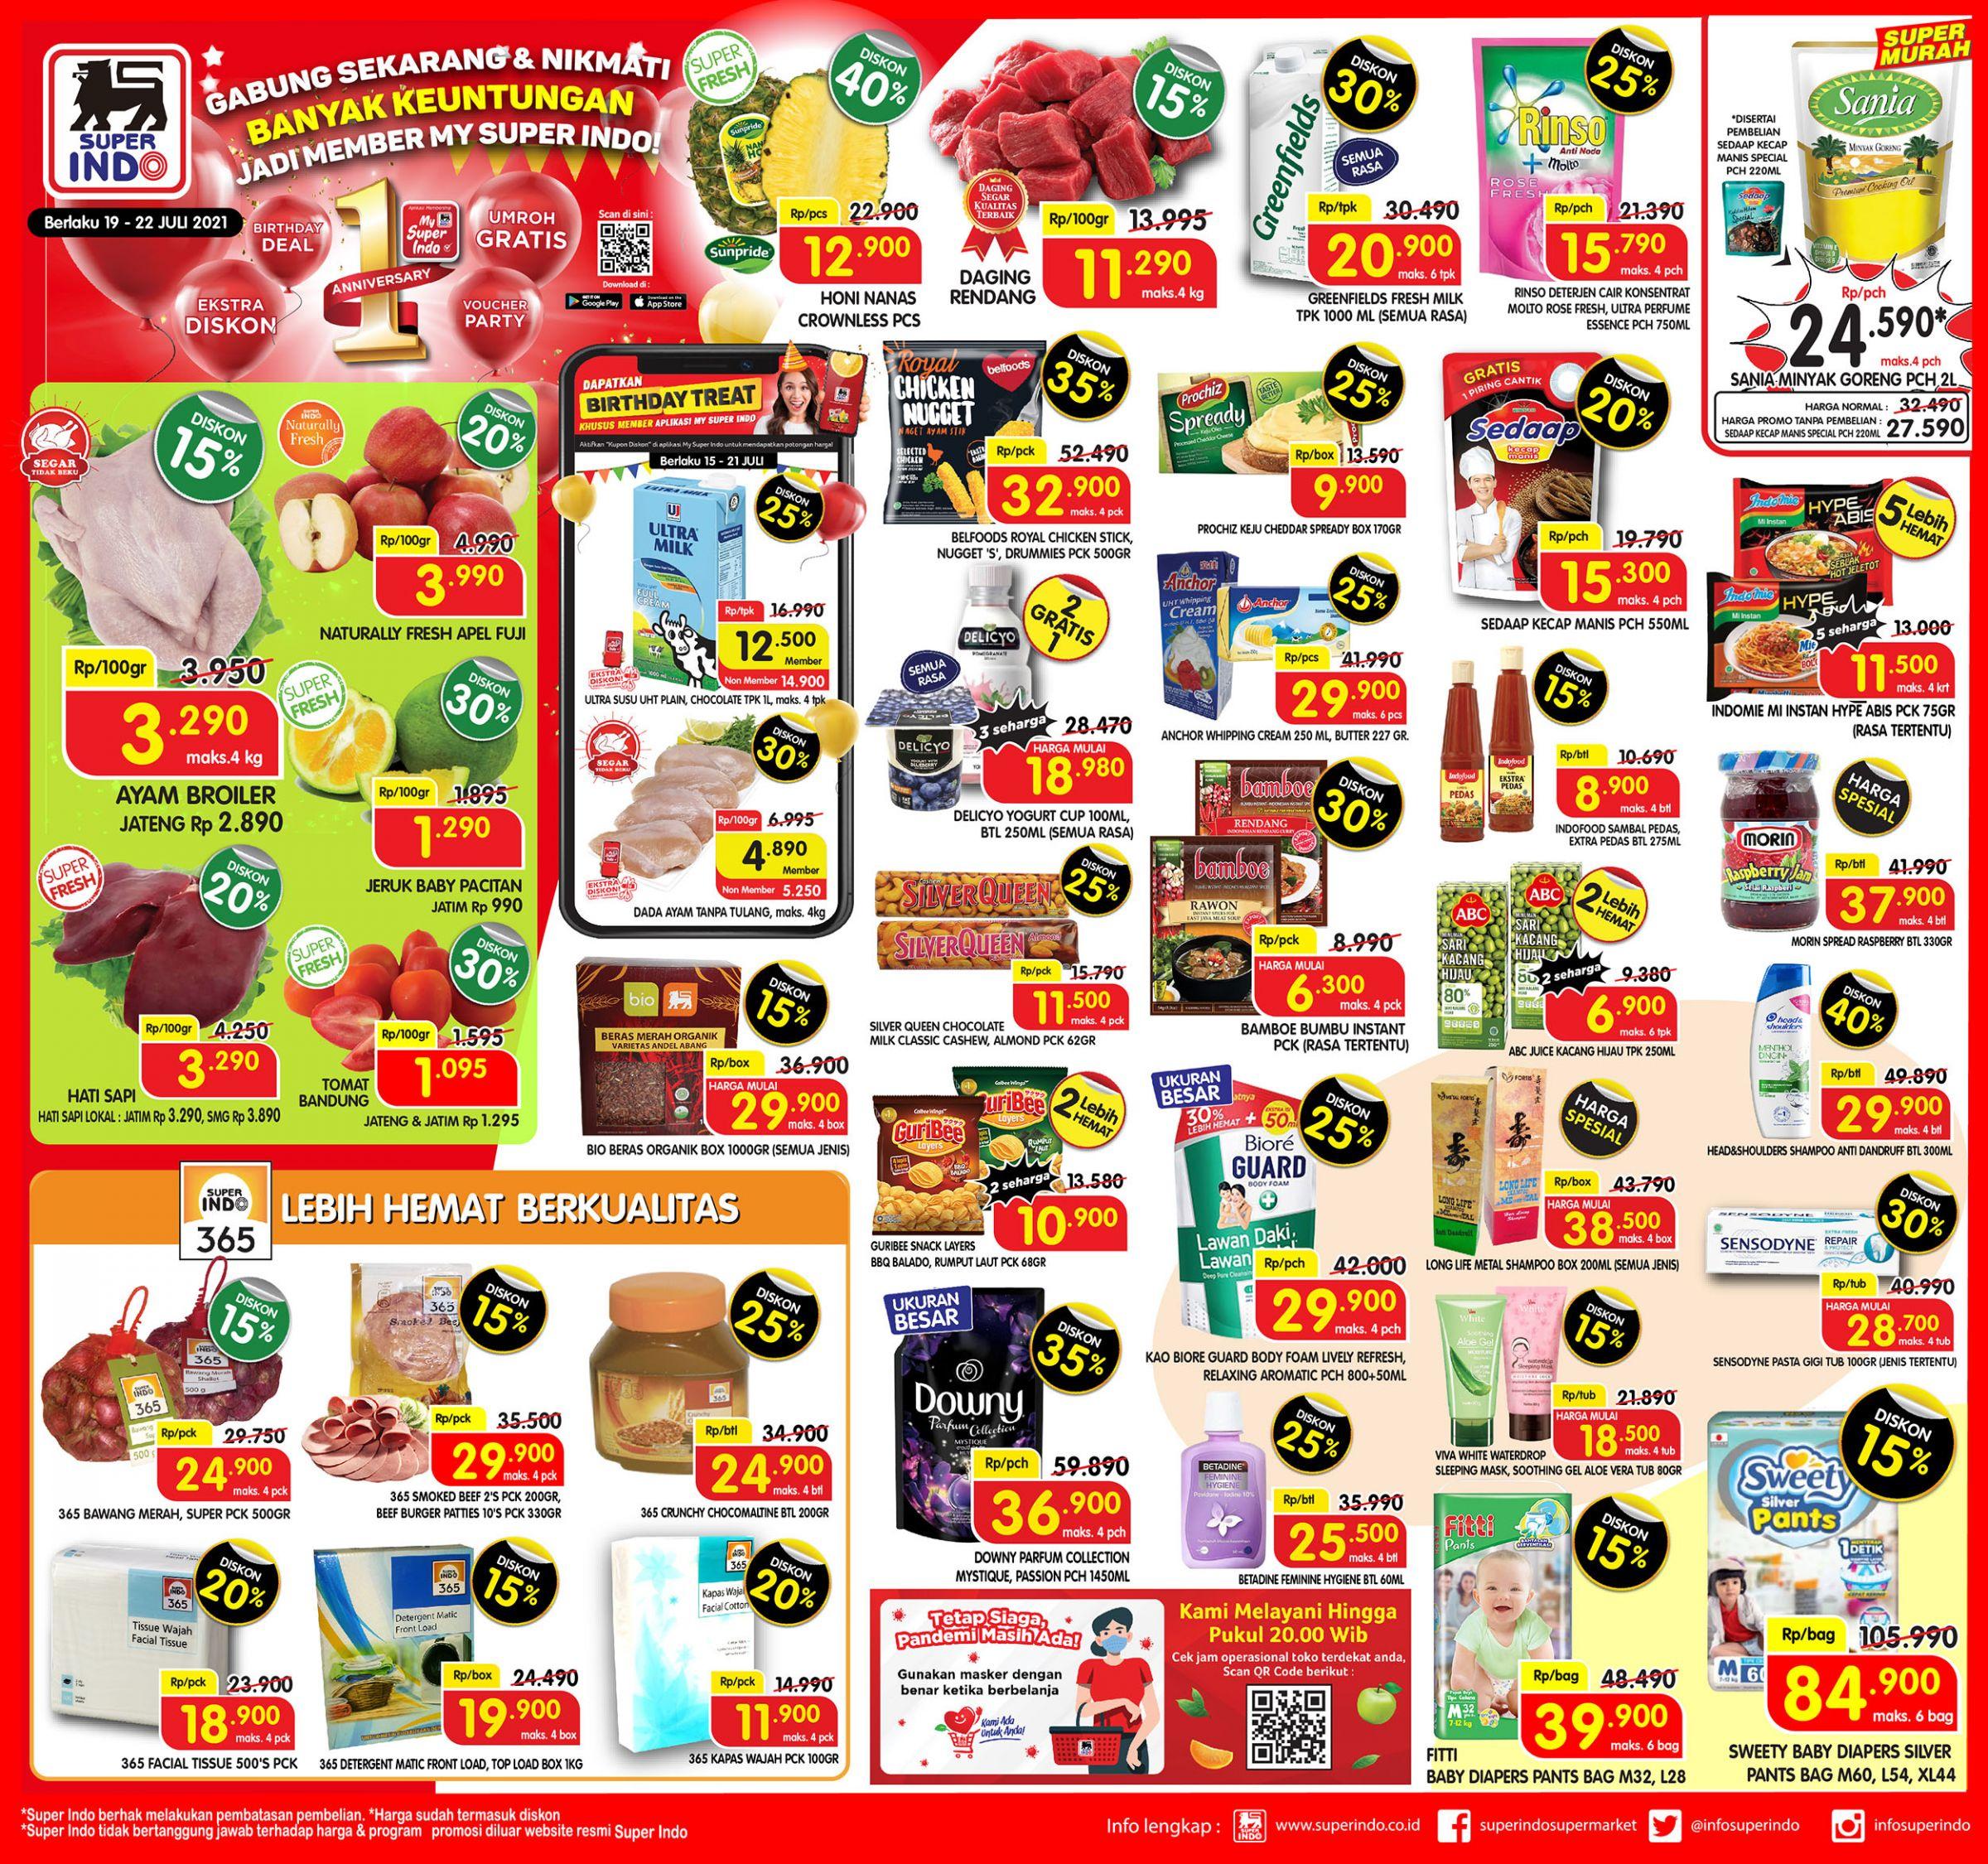 Promo Superindo Katalog Awal Pekan (Weekday) periode 19-22 Juli 2021